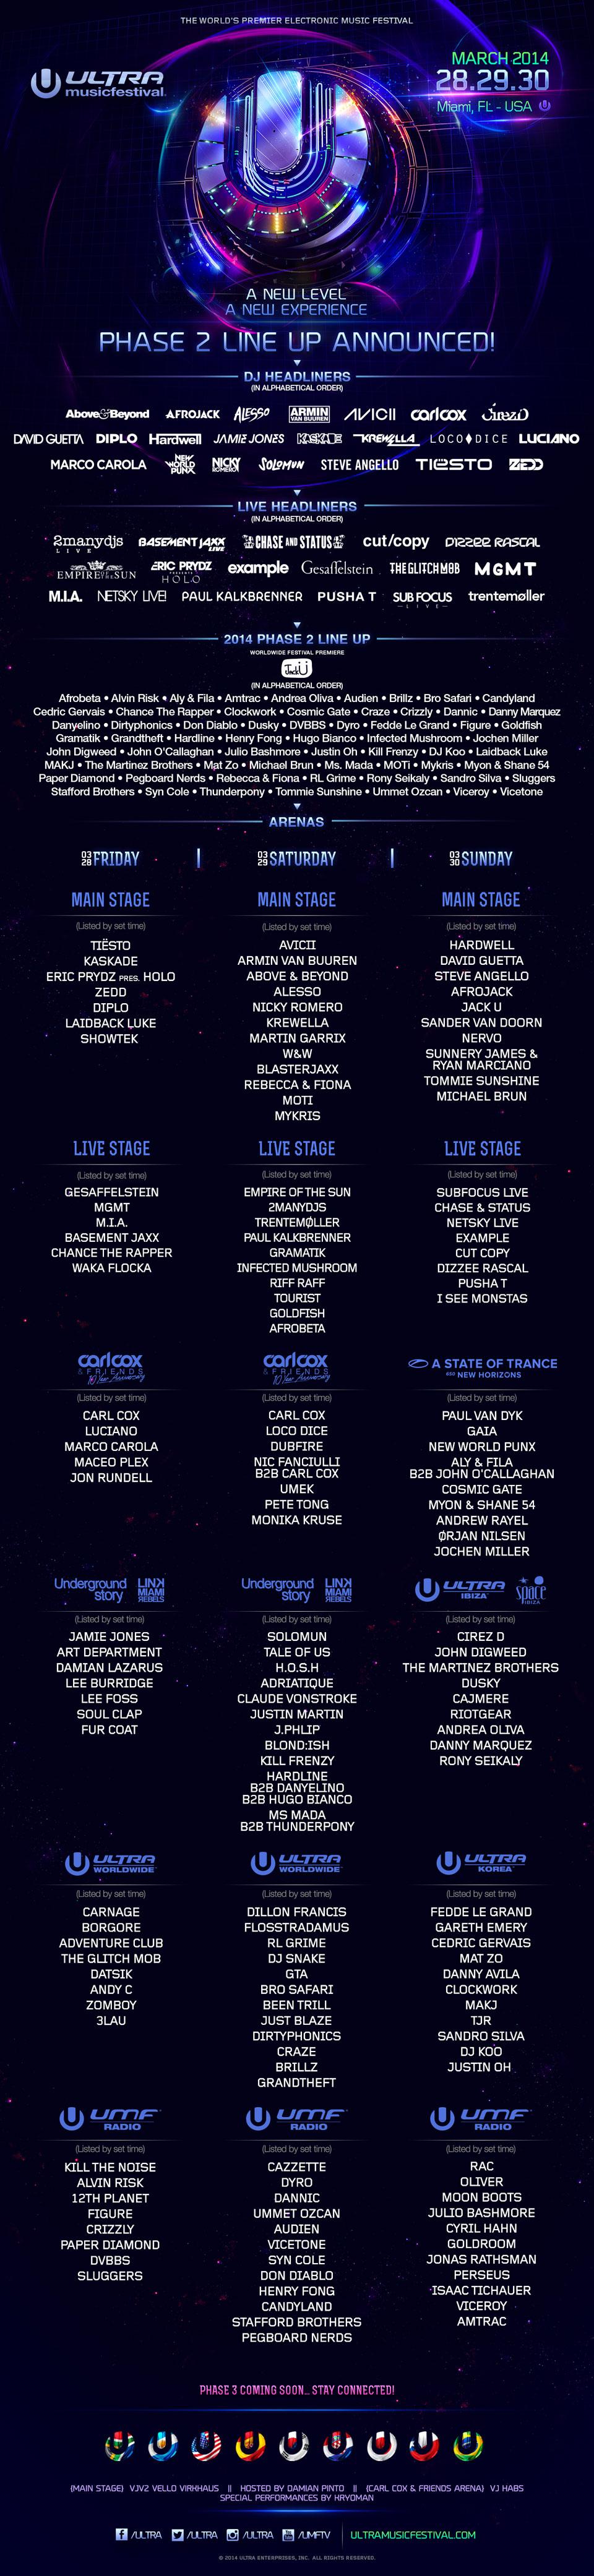 Ultra Music Festival Logo Black - Viewing Gallery